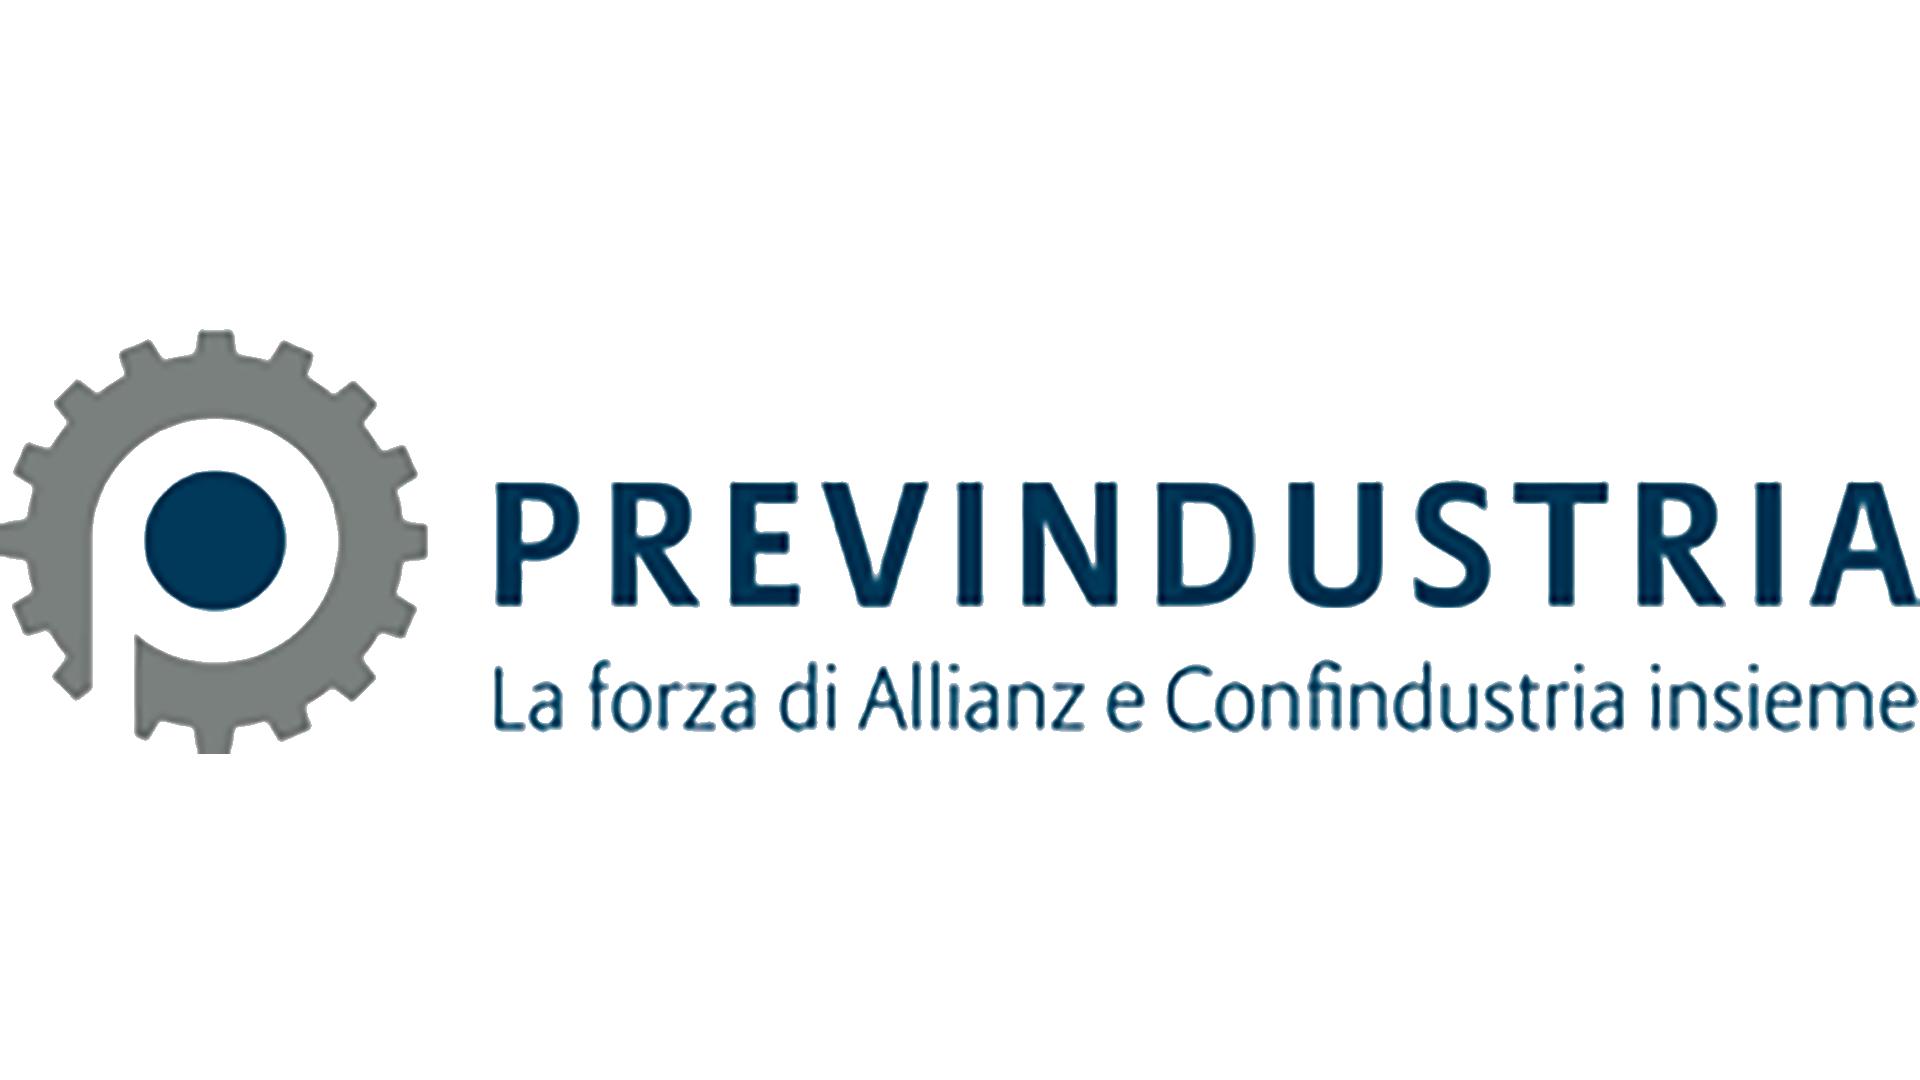 logo-previndustria-1920×1080